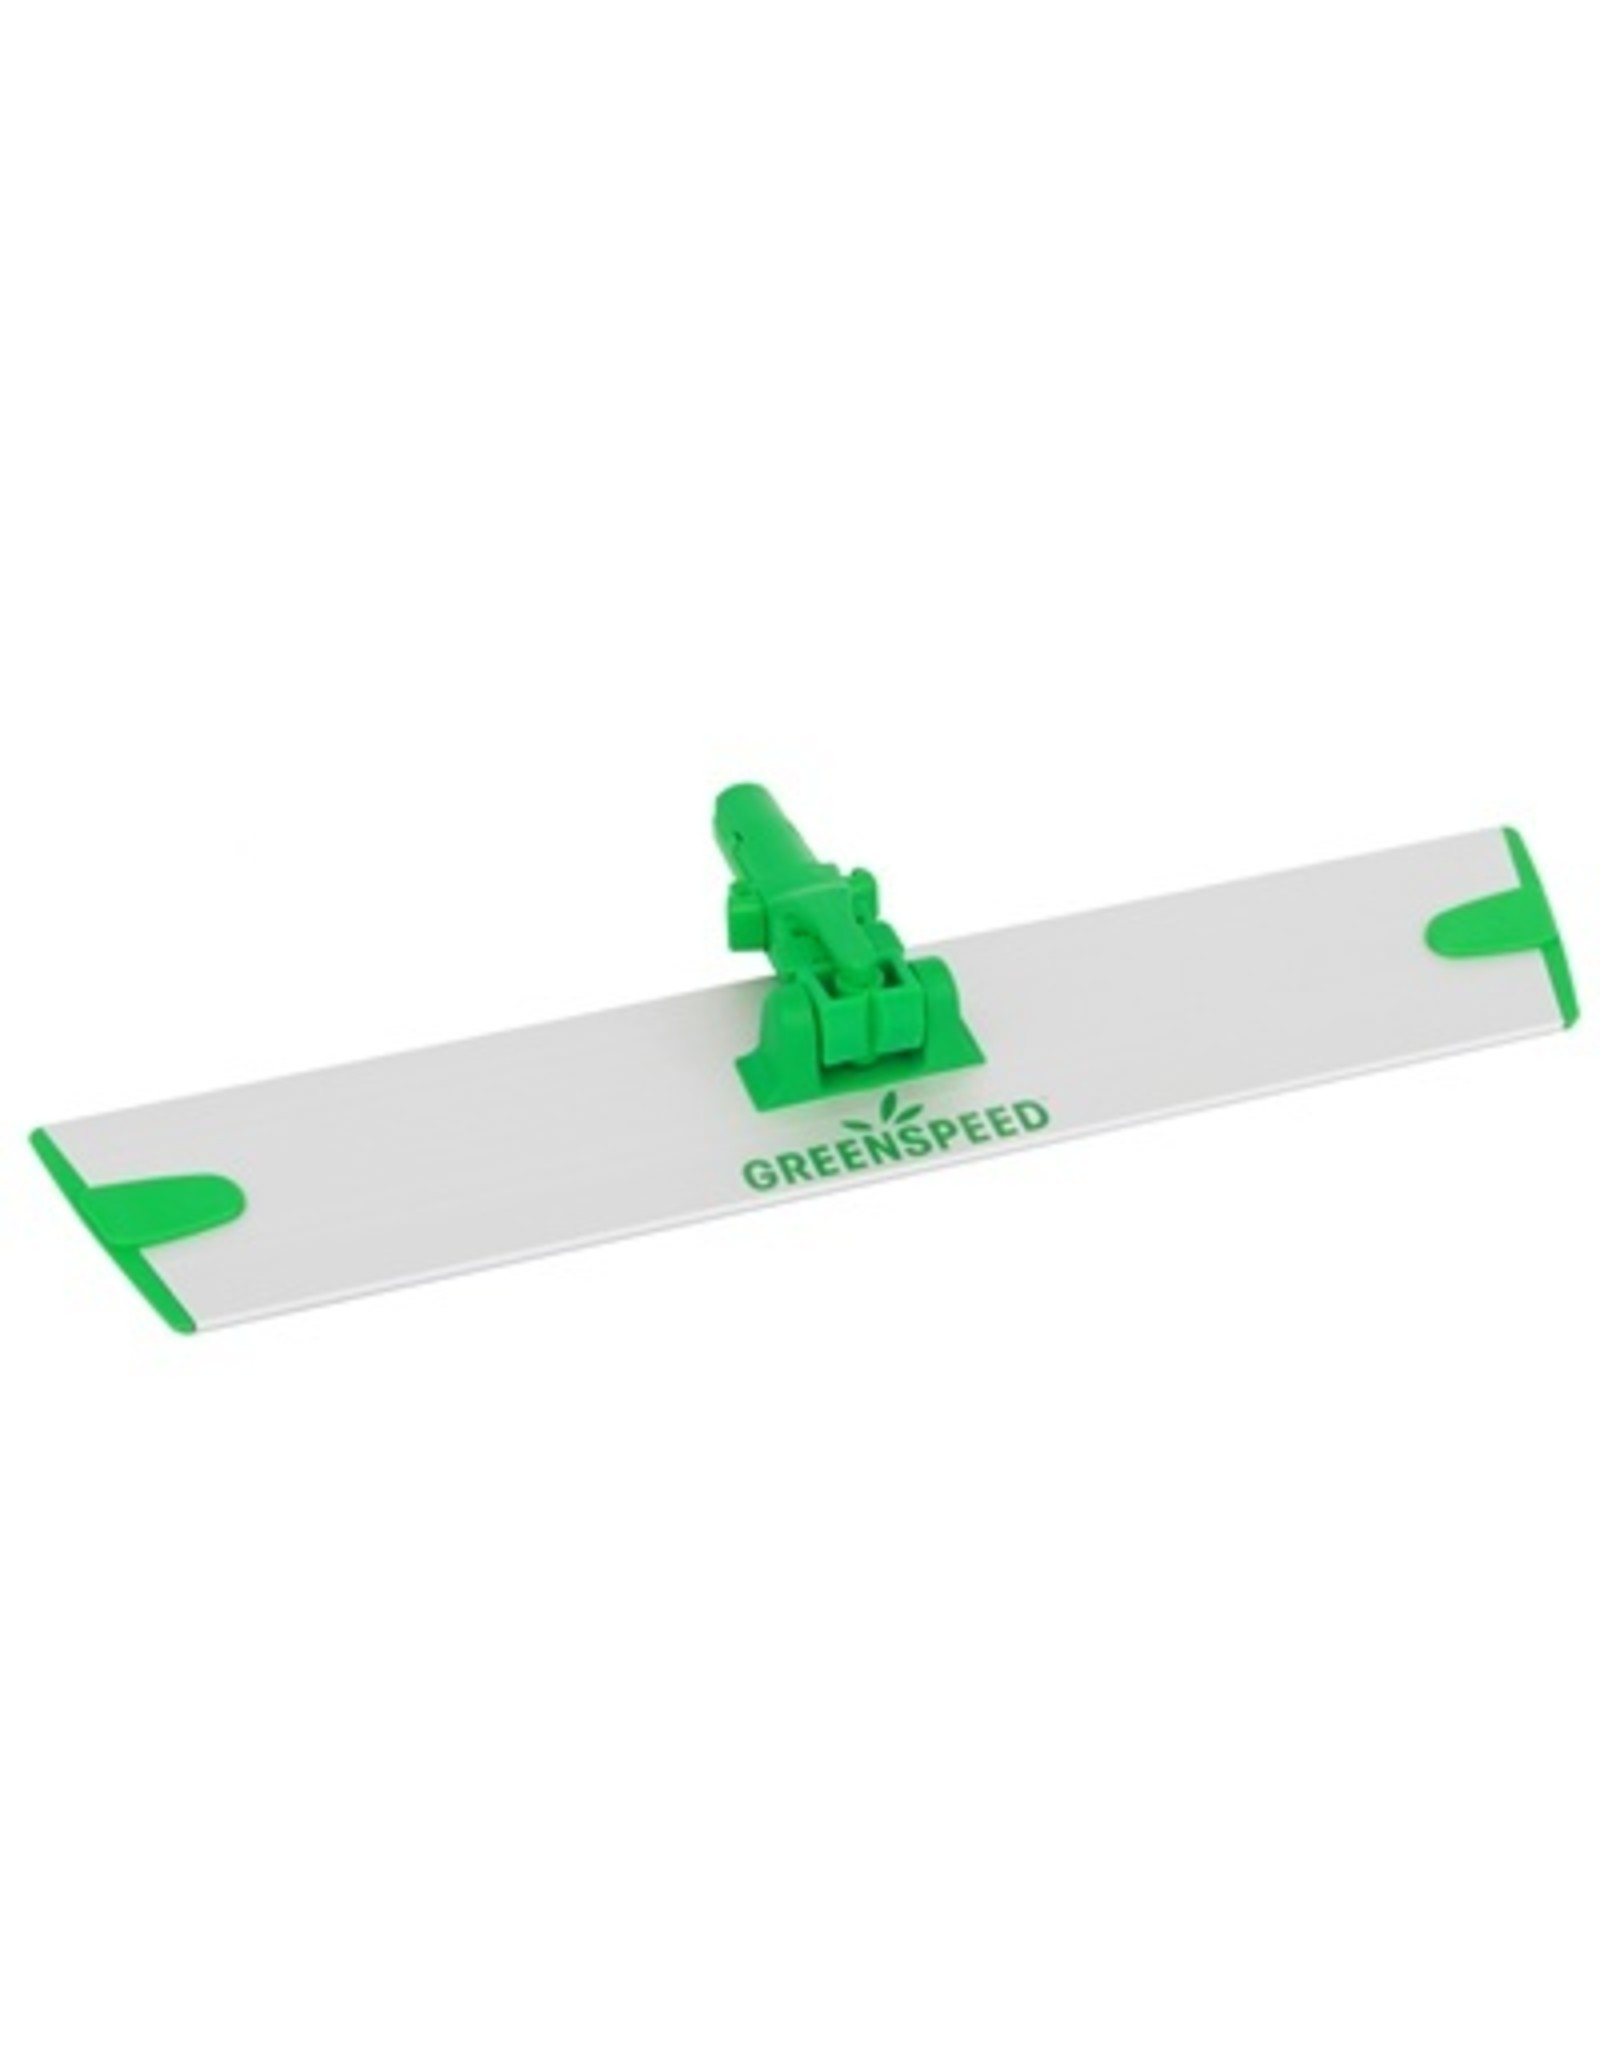 GREENSPEED Vlakmopplaten Greenspeed  Velcro